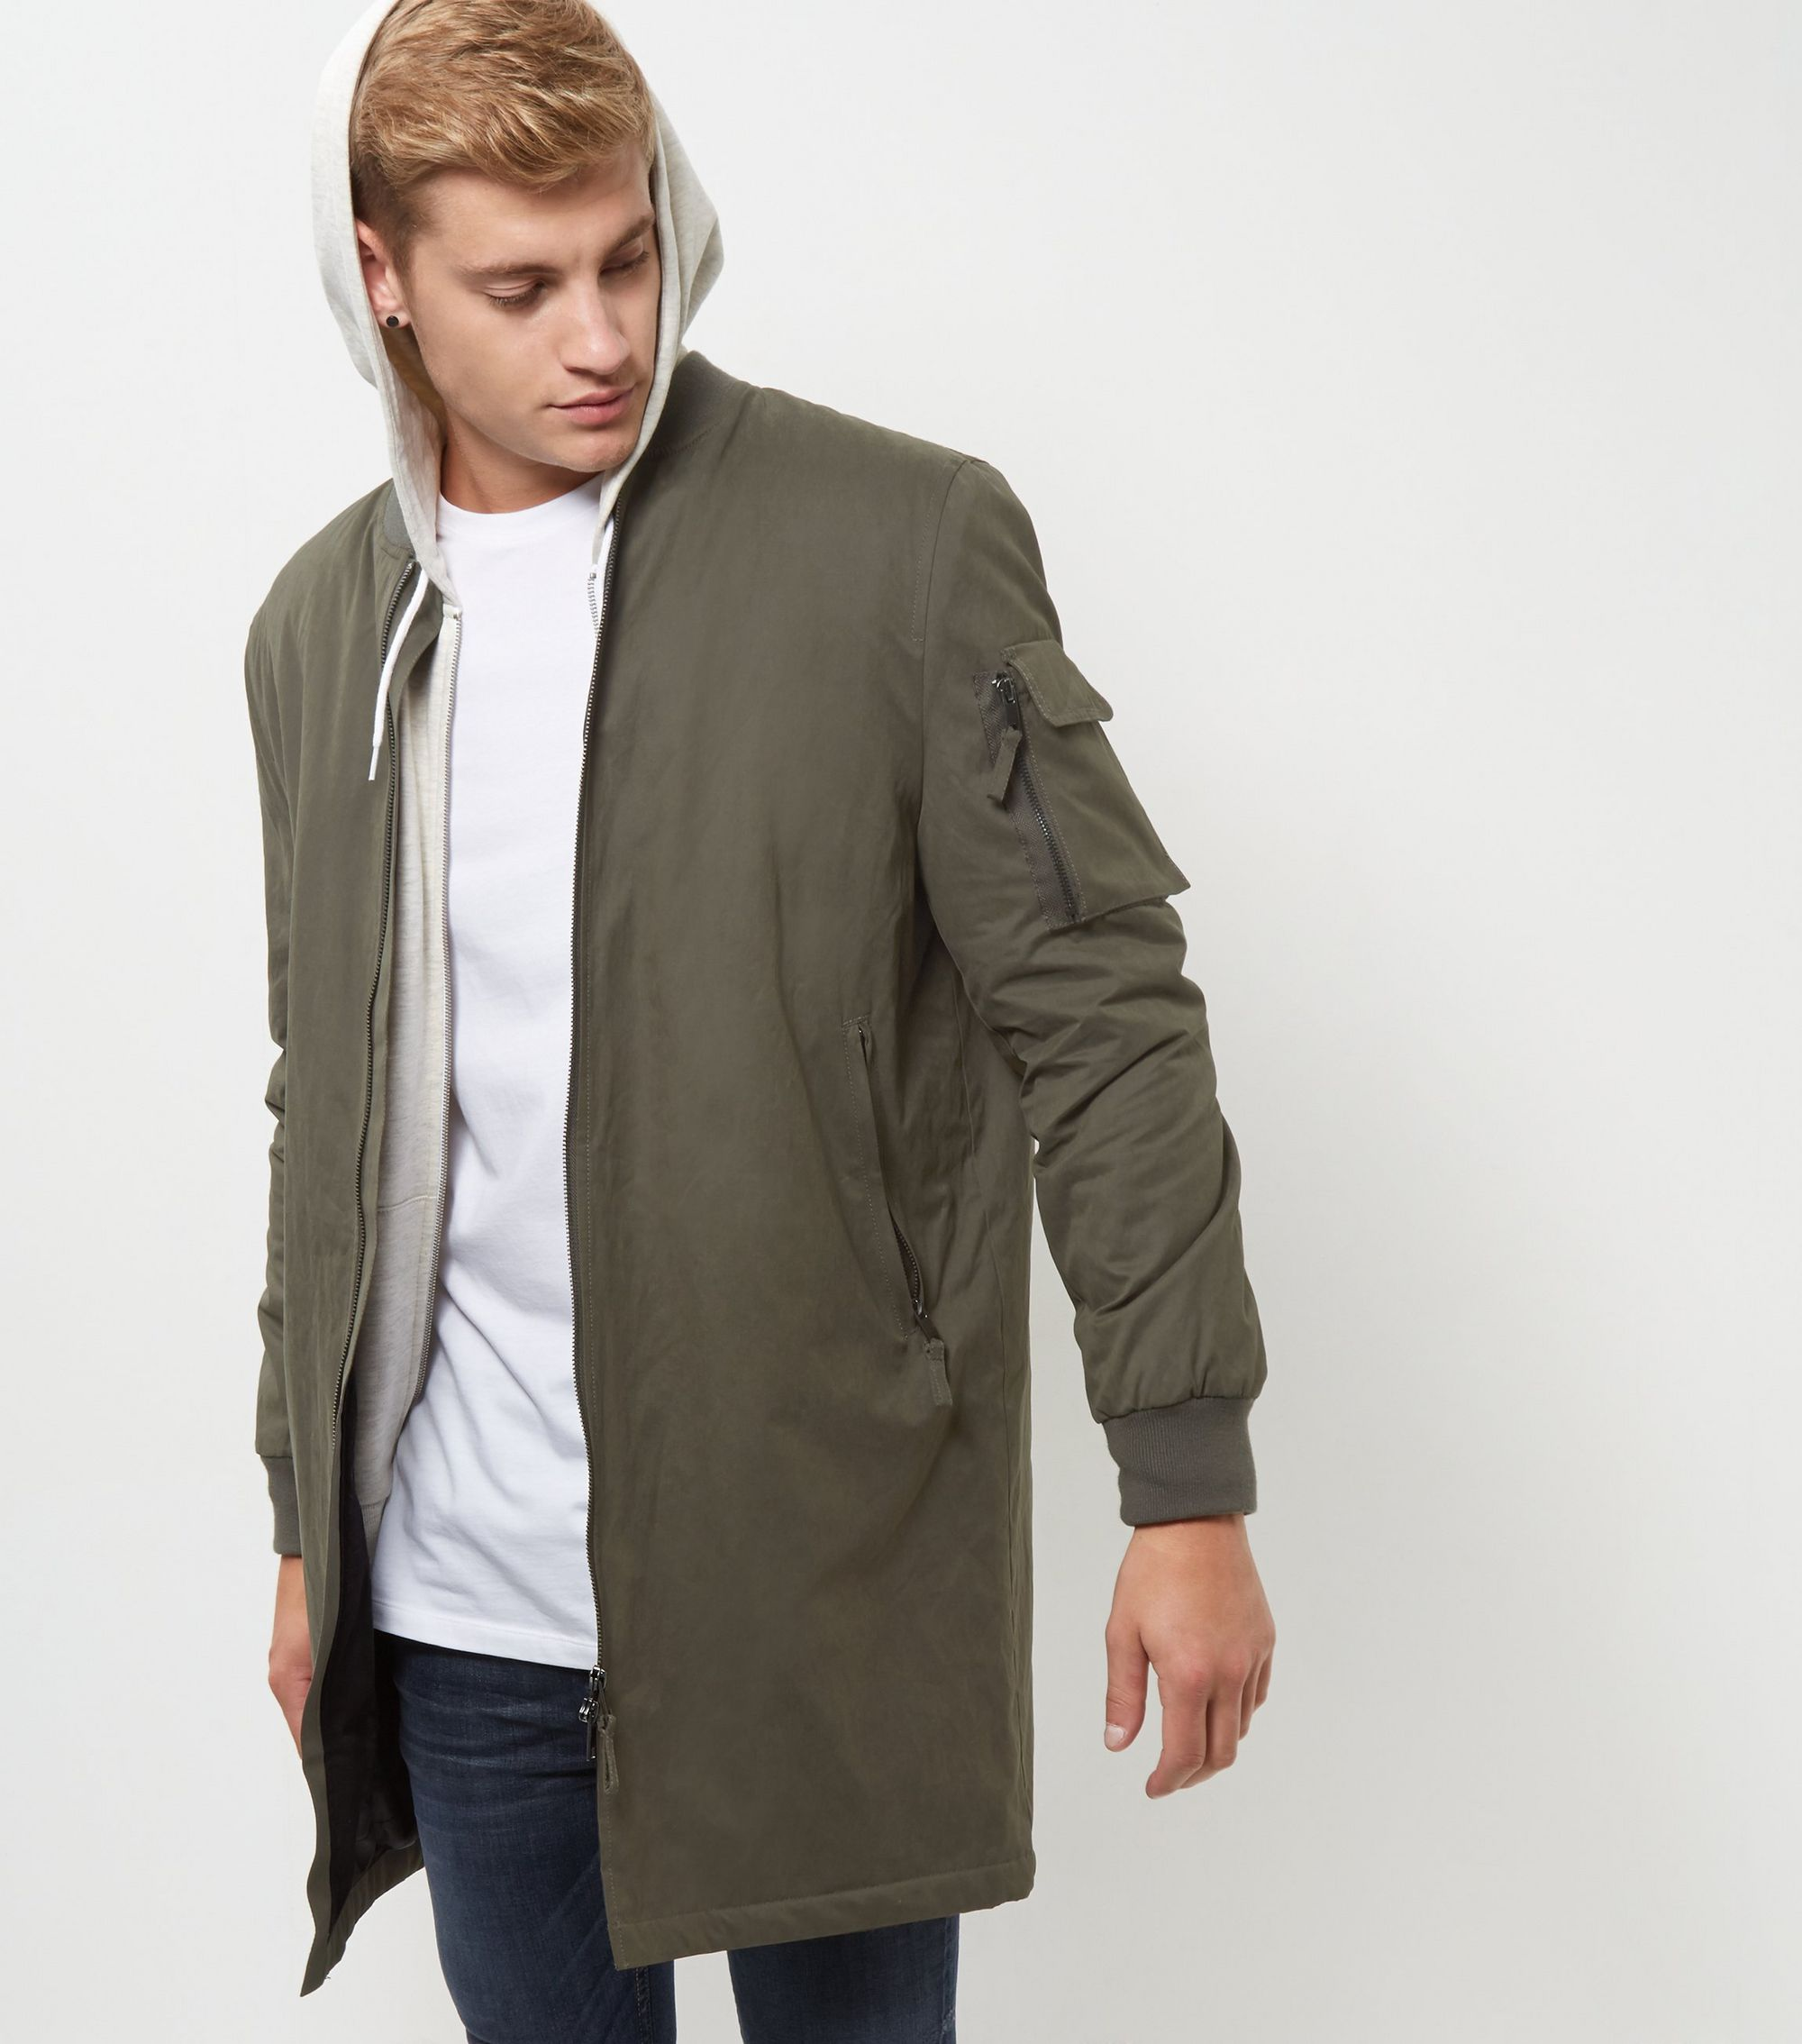 http://media.newlookassets.com/i/newlook/382432534/mens/jackets-and-coats/jackets/khaki-longline-bomber-jacket/?$new_pdp_szoom_image_2000$